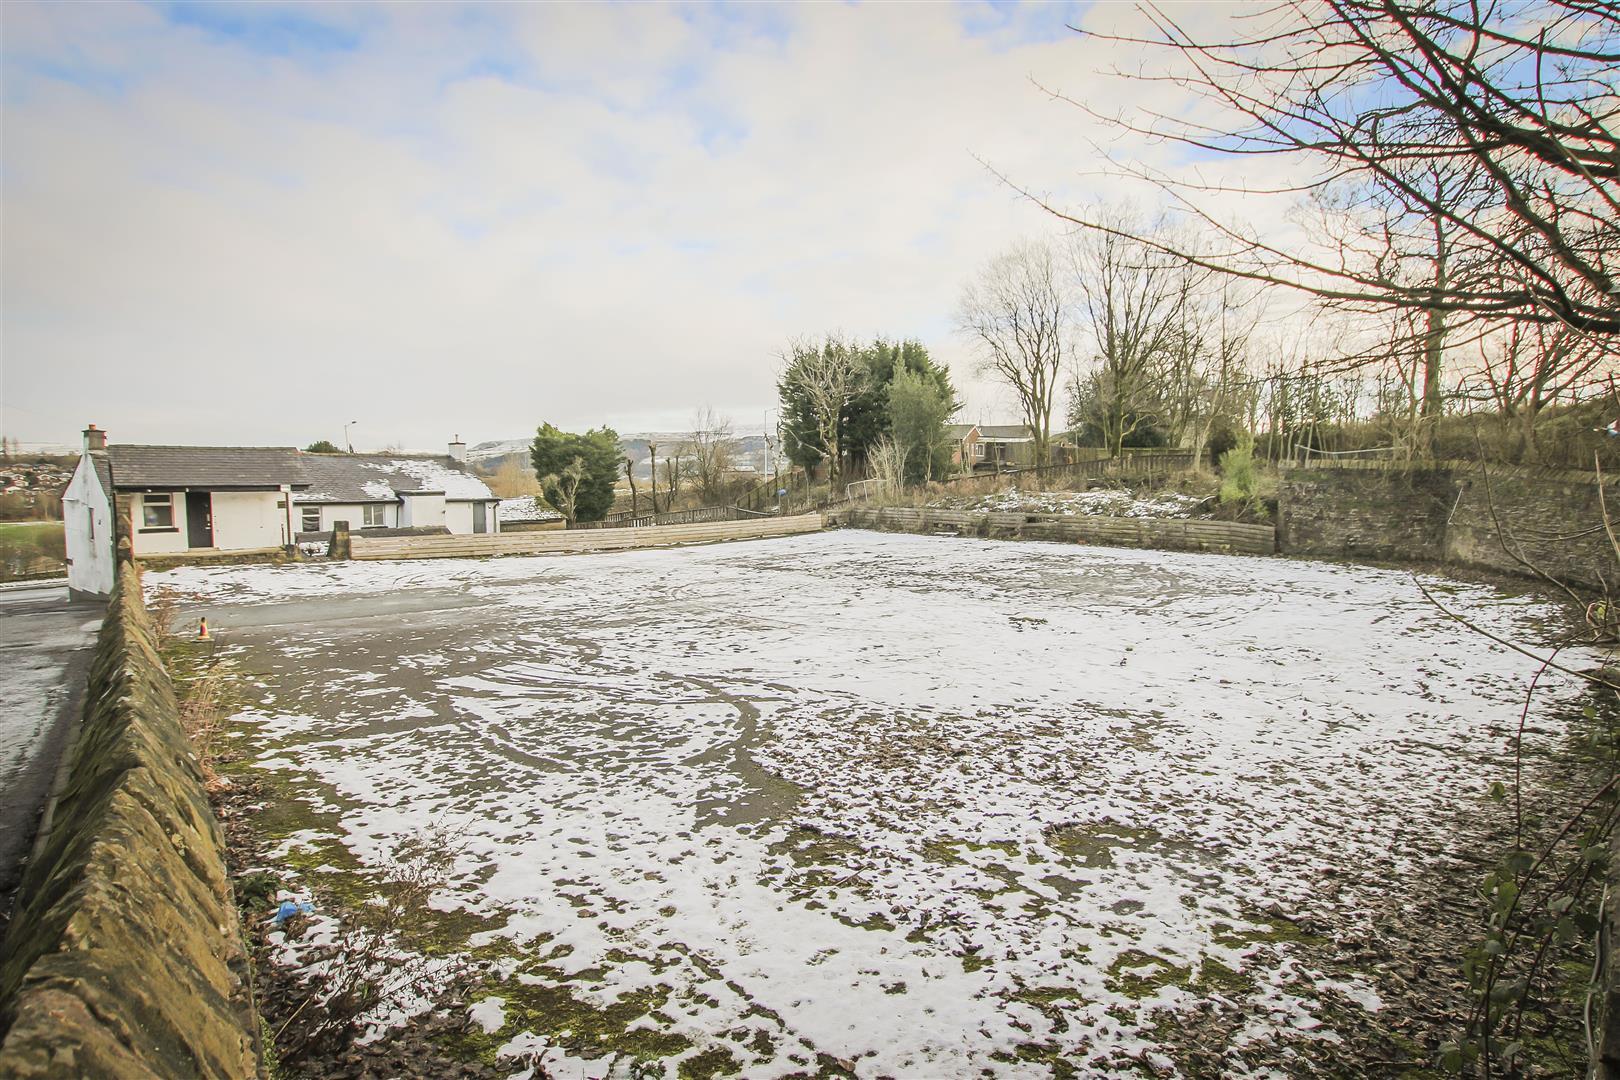 Development Site Land For Sale - Image 5